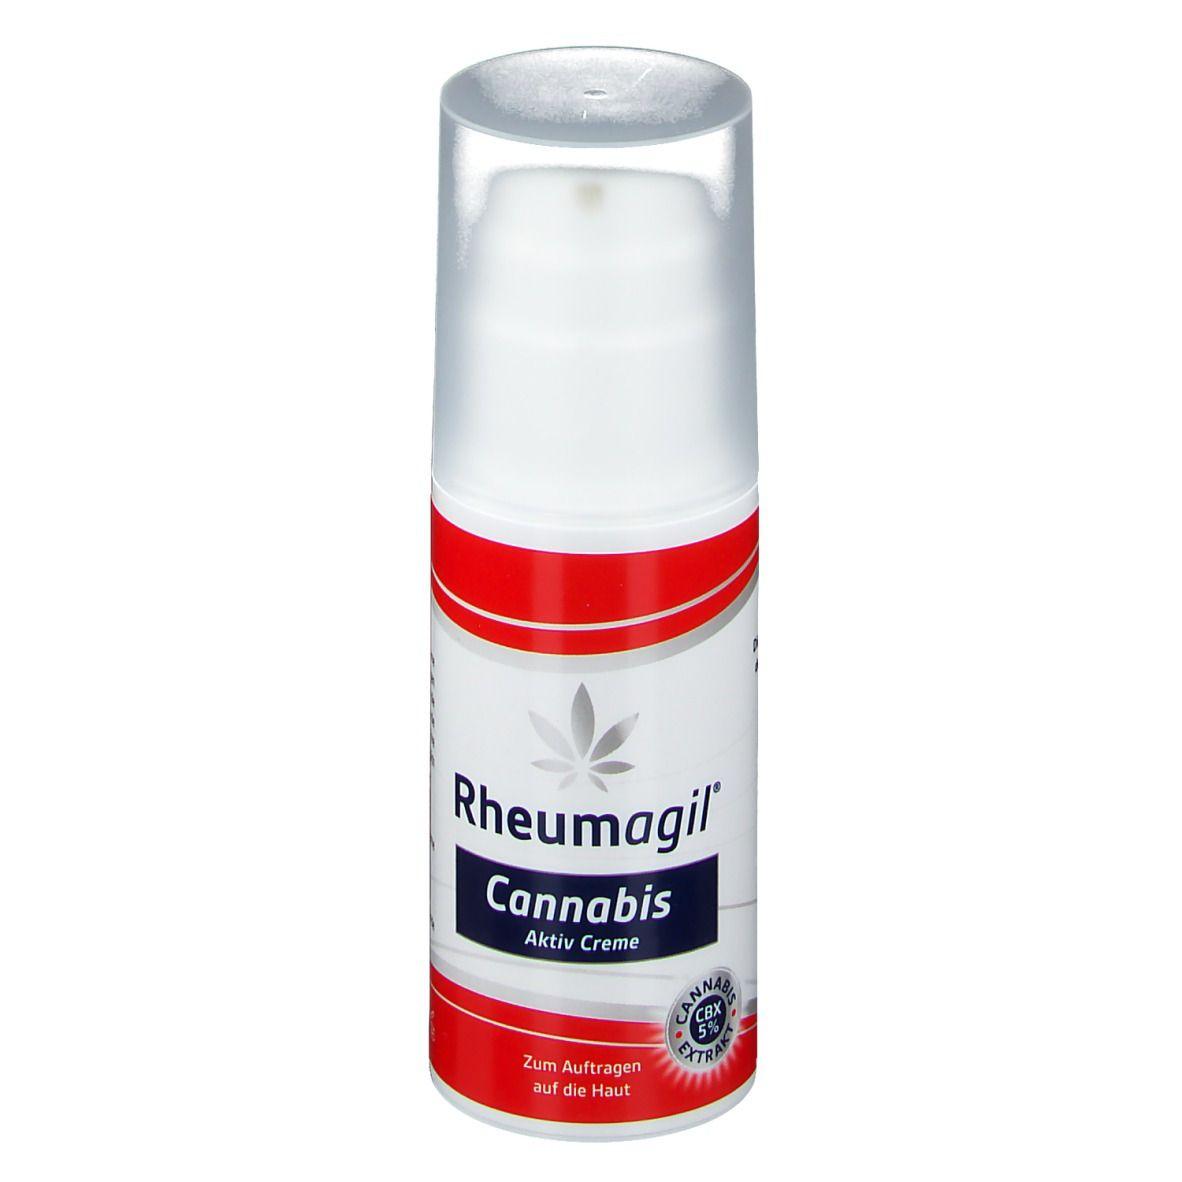 Rheumagil ® Cannabis Aktiv Creme